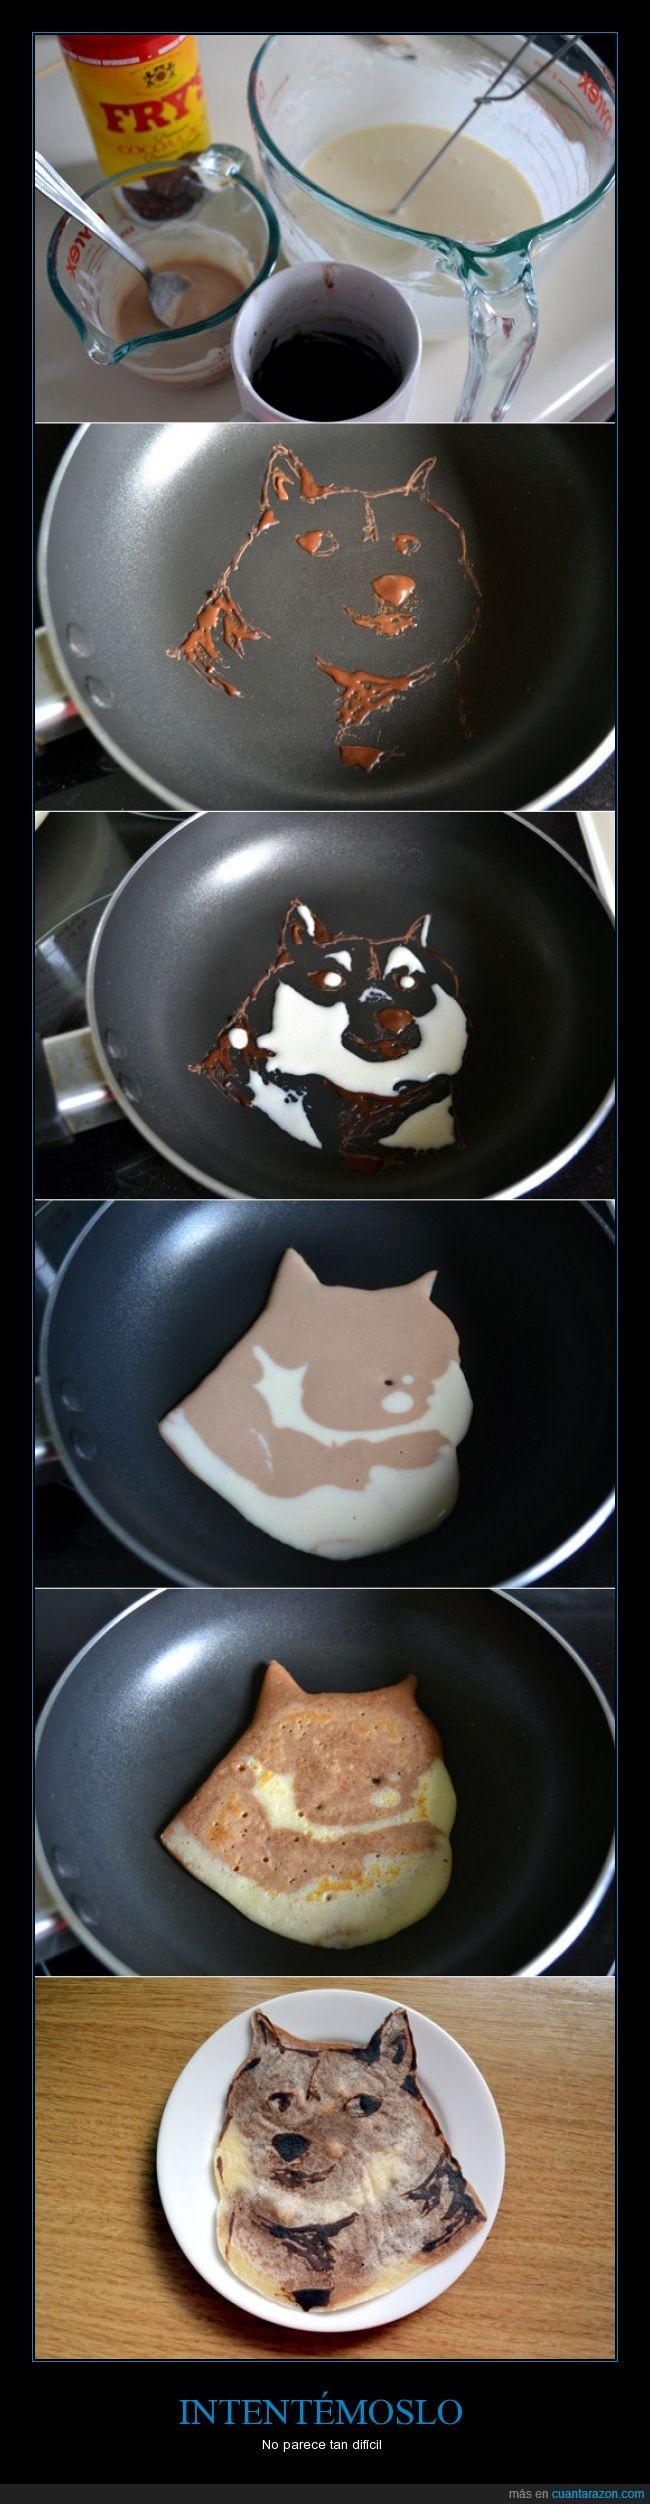 desayuno,doge,pancake,perrito,tostada,wafle